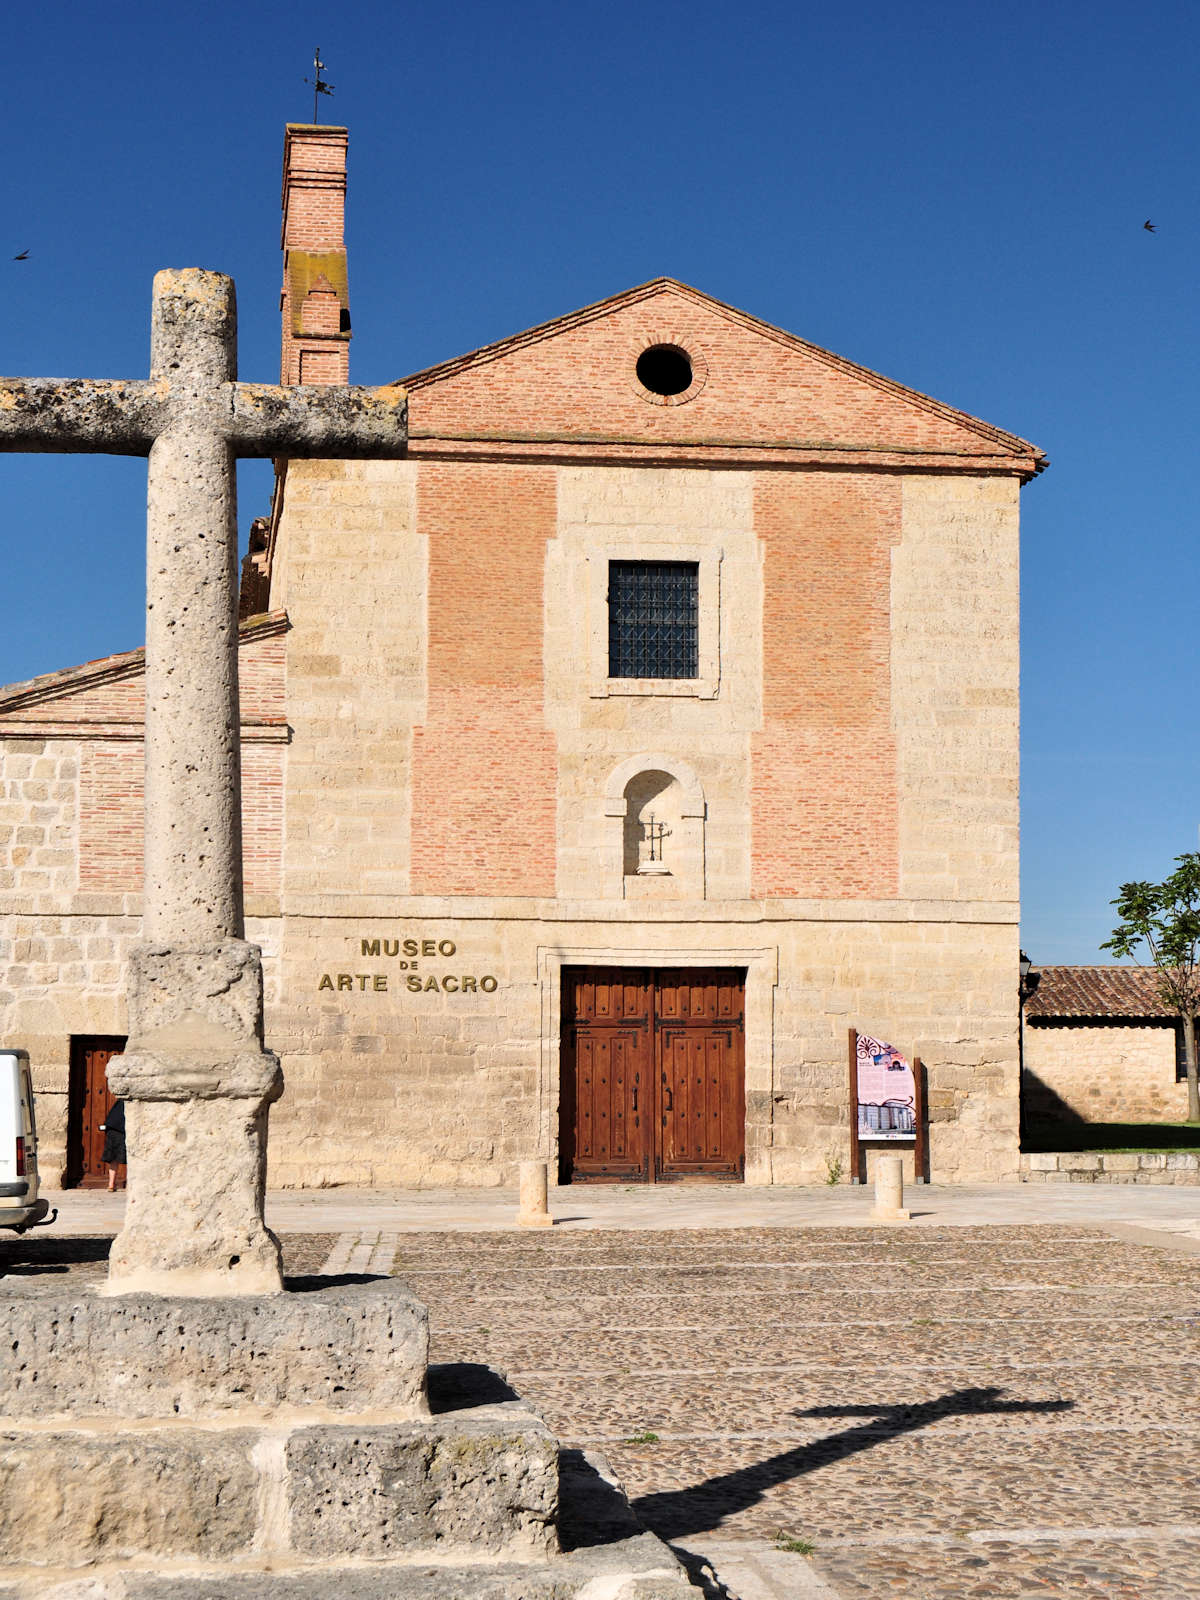 Museo-de-Arte-Sacro-Ampudia-Palencia